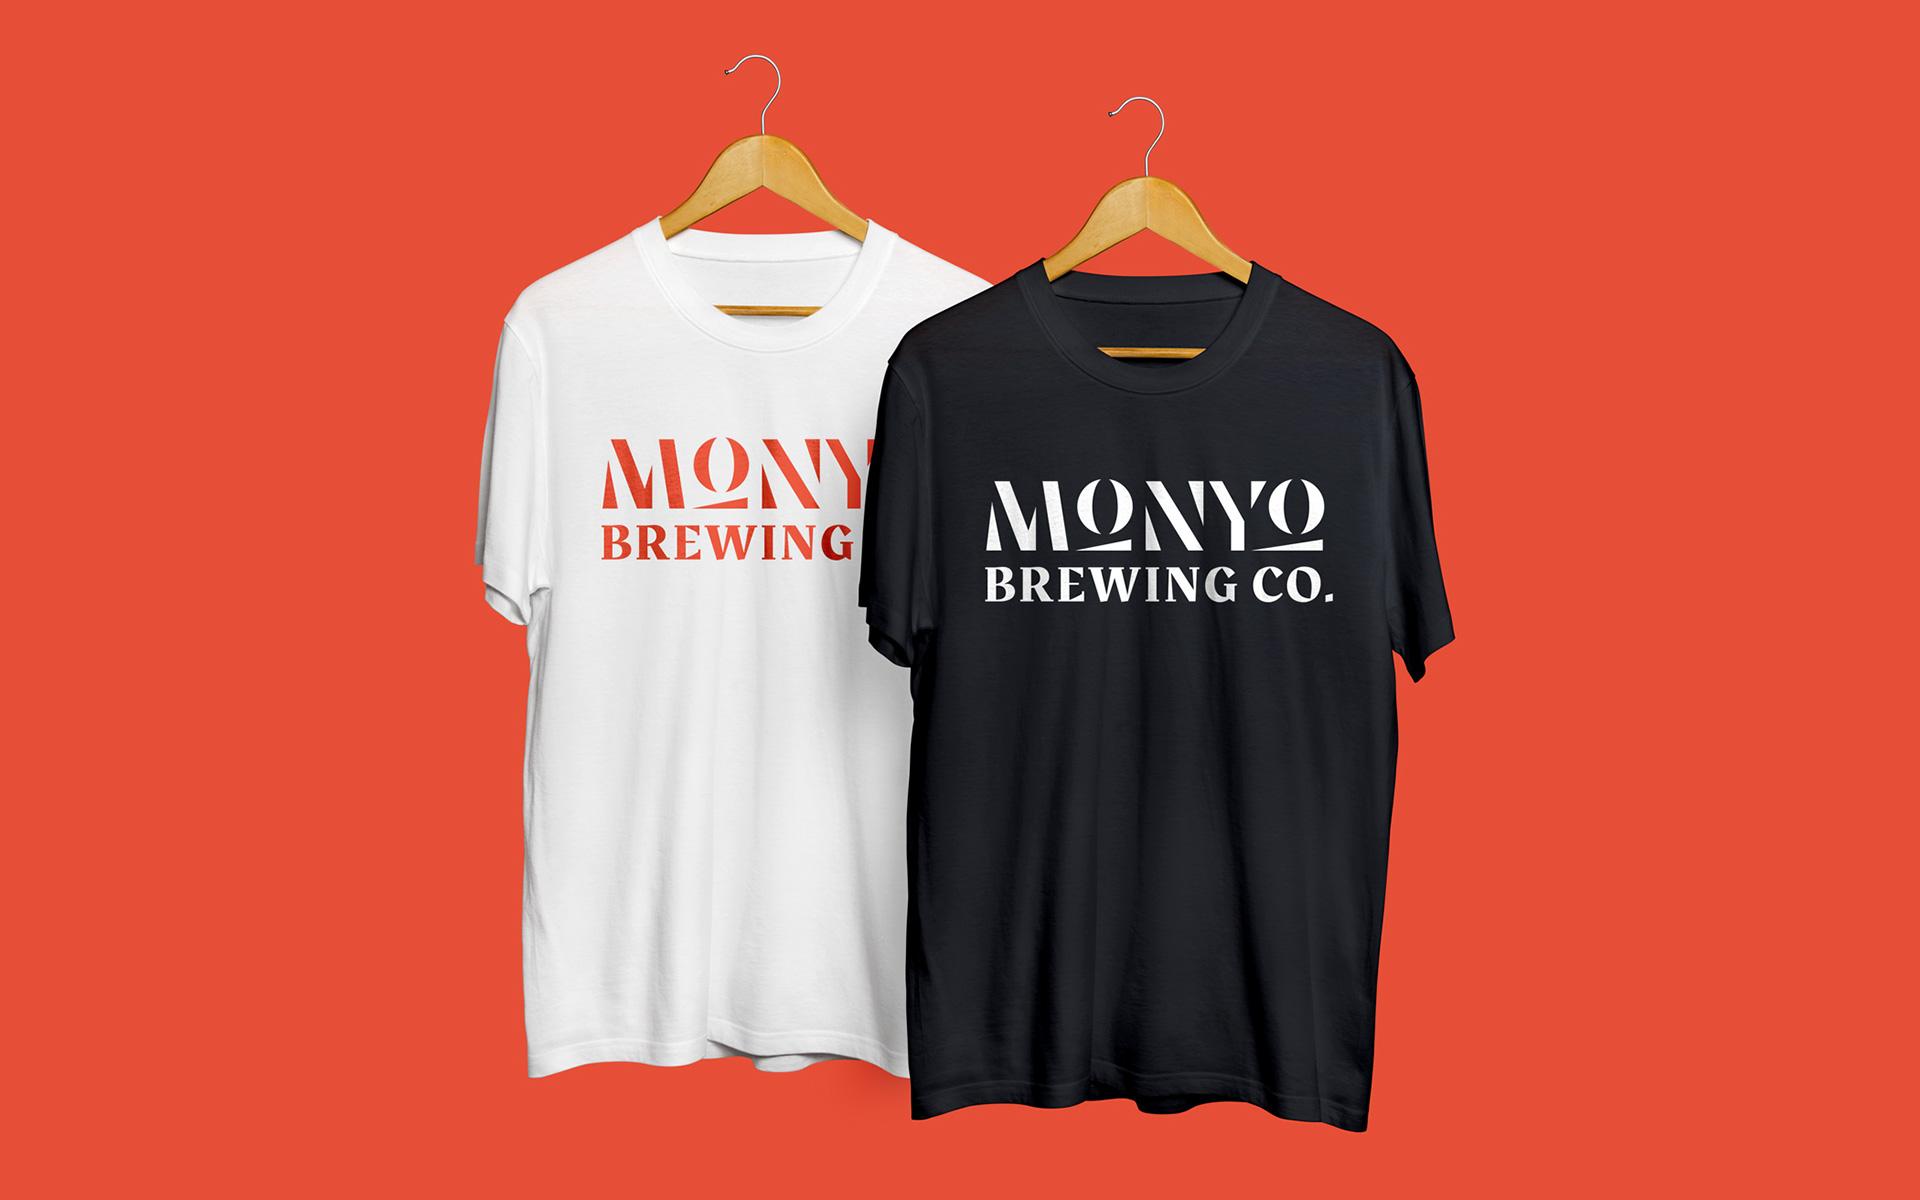 MONYO craft beer packaging \ T-shirt design